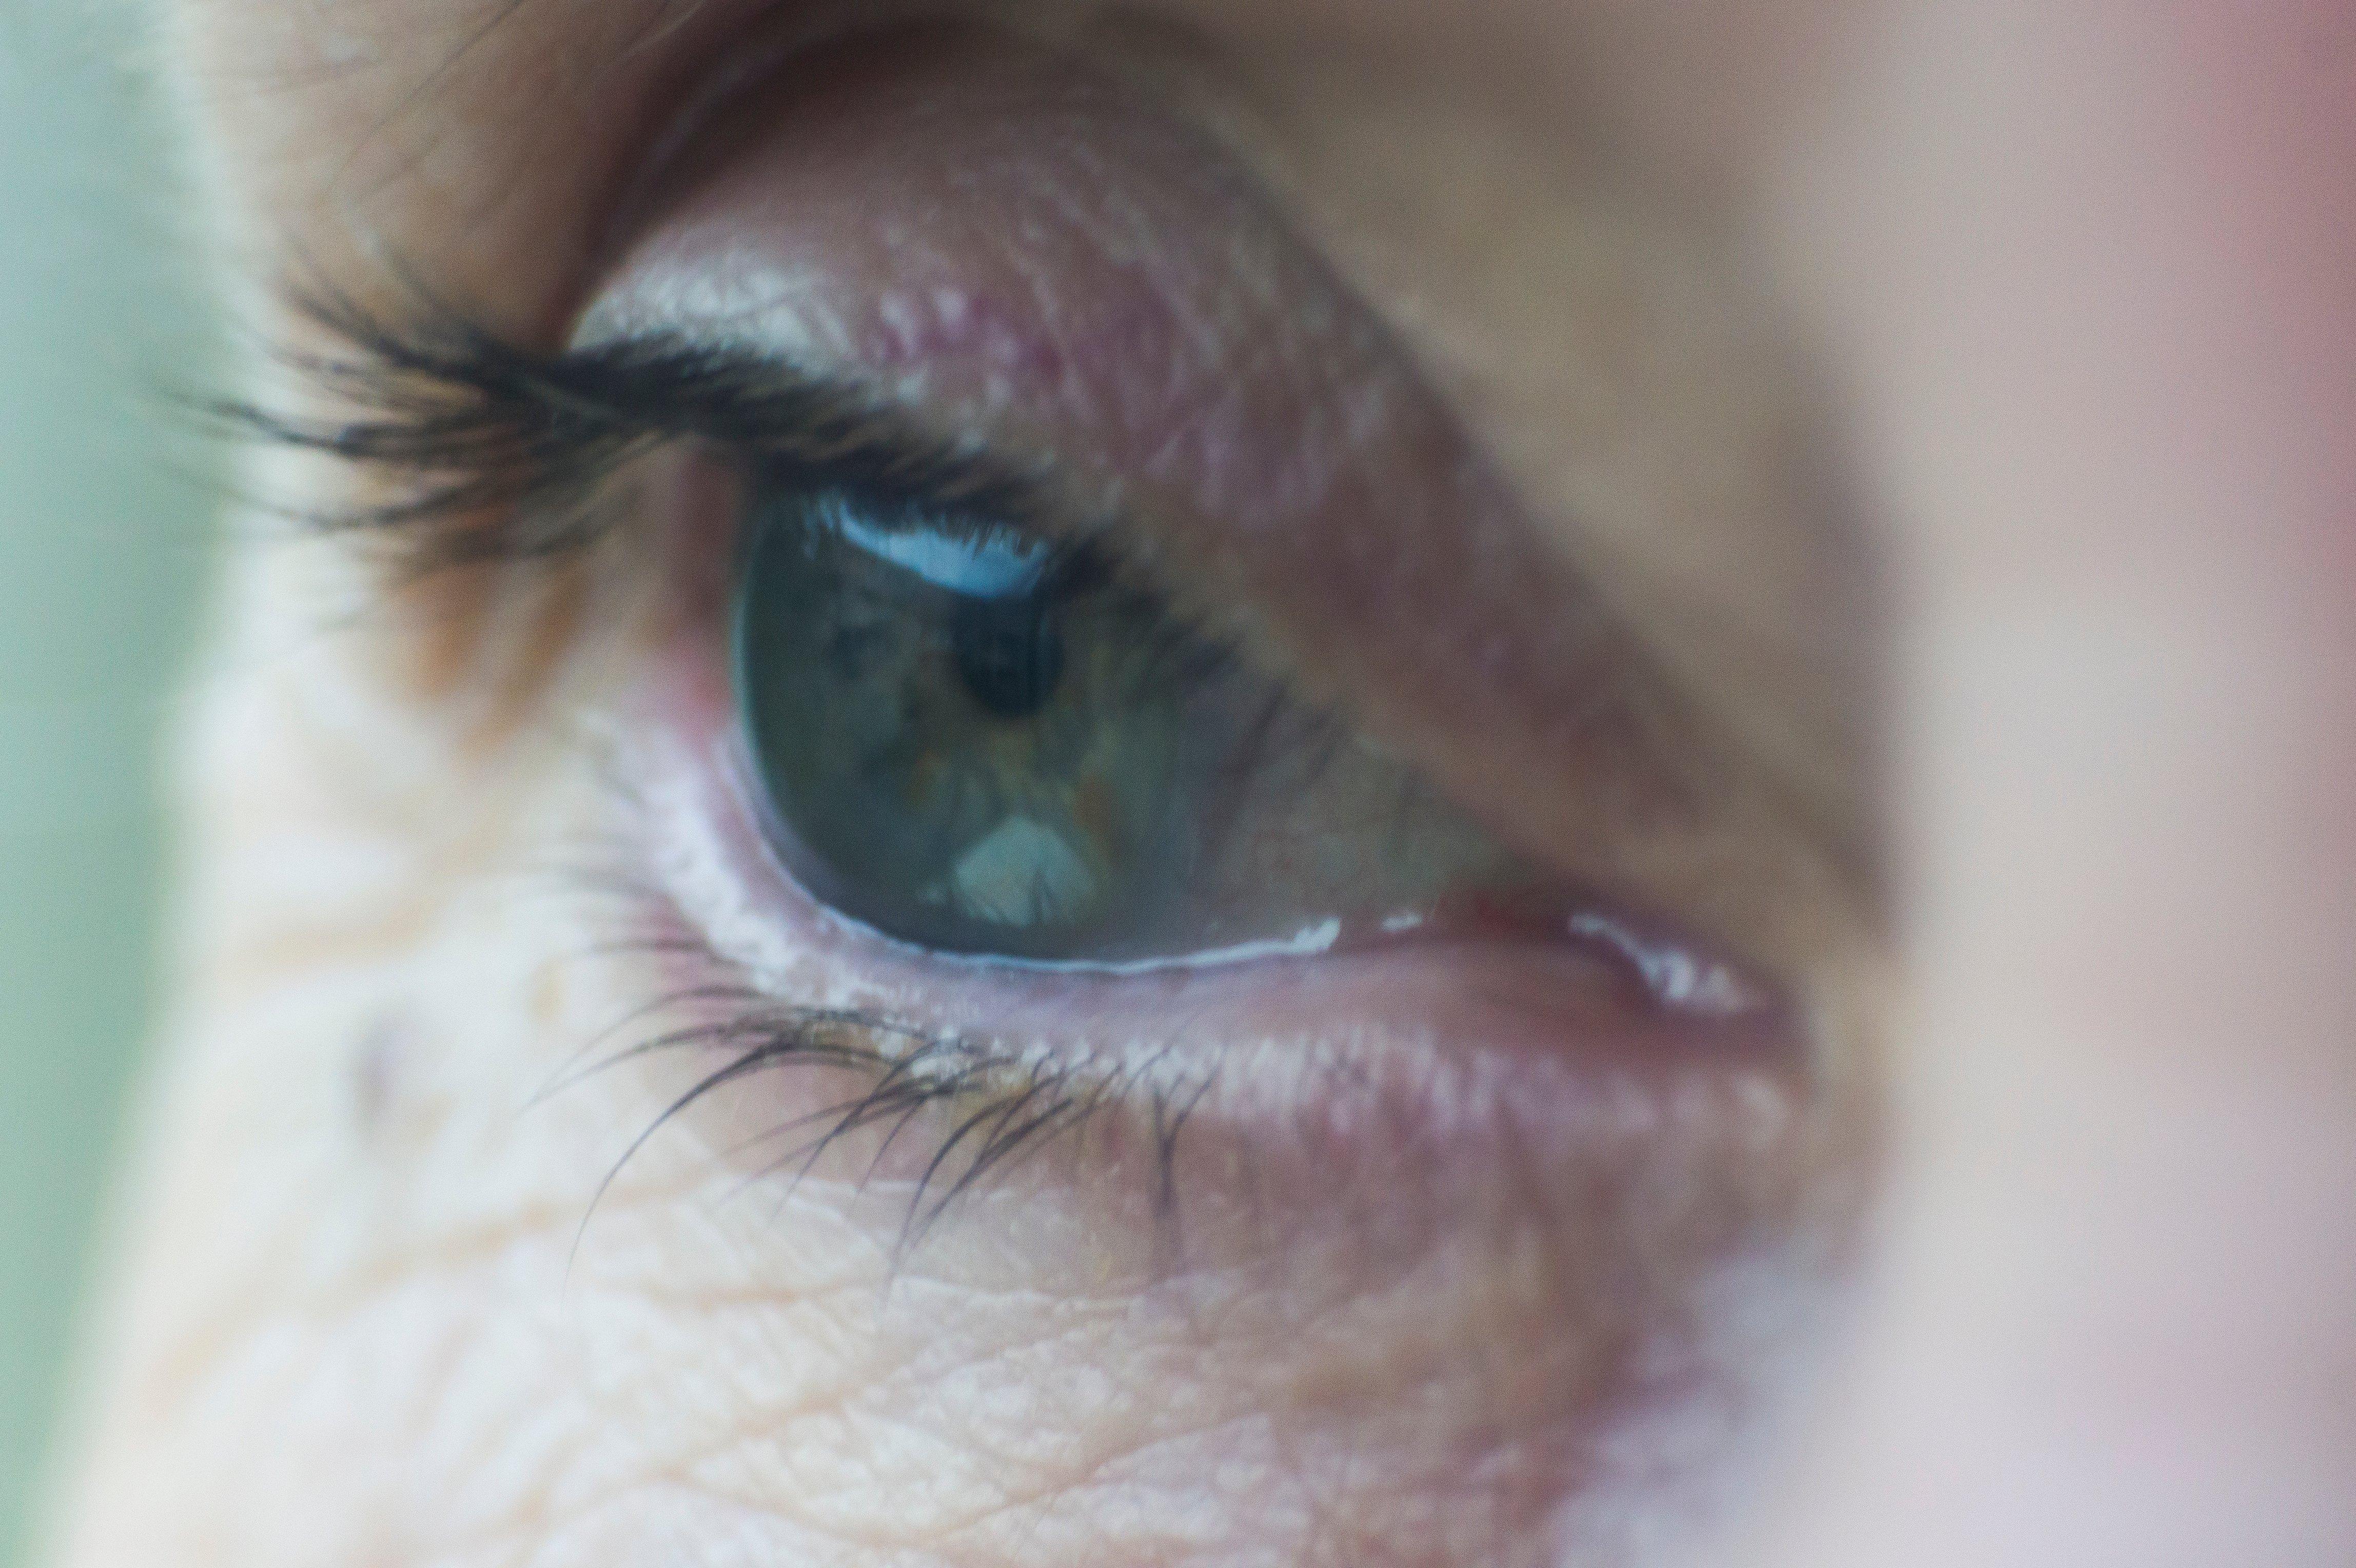 L'œil d'une femme en gros plan   Photo : Shutterstock